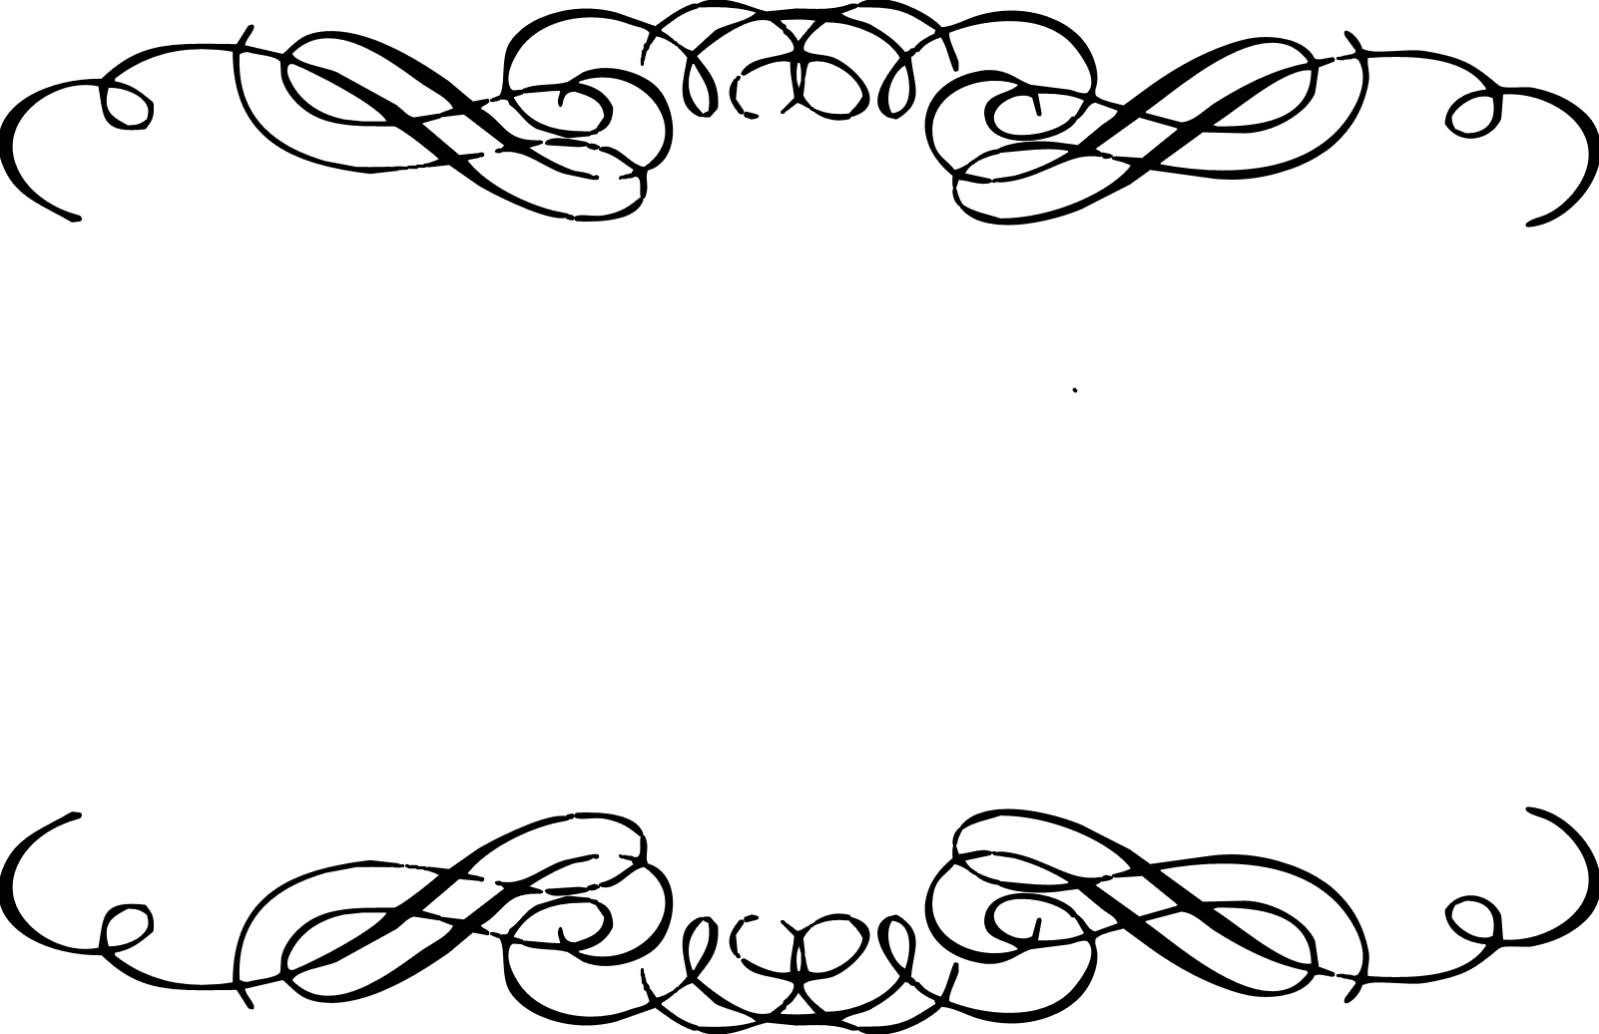 swirl border clipart-swirl border clipart-3